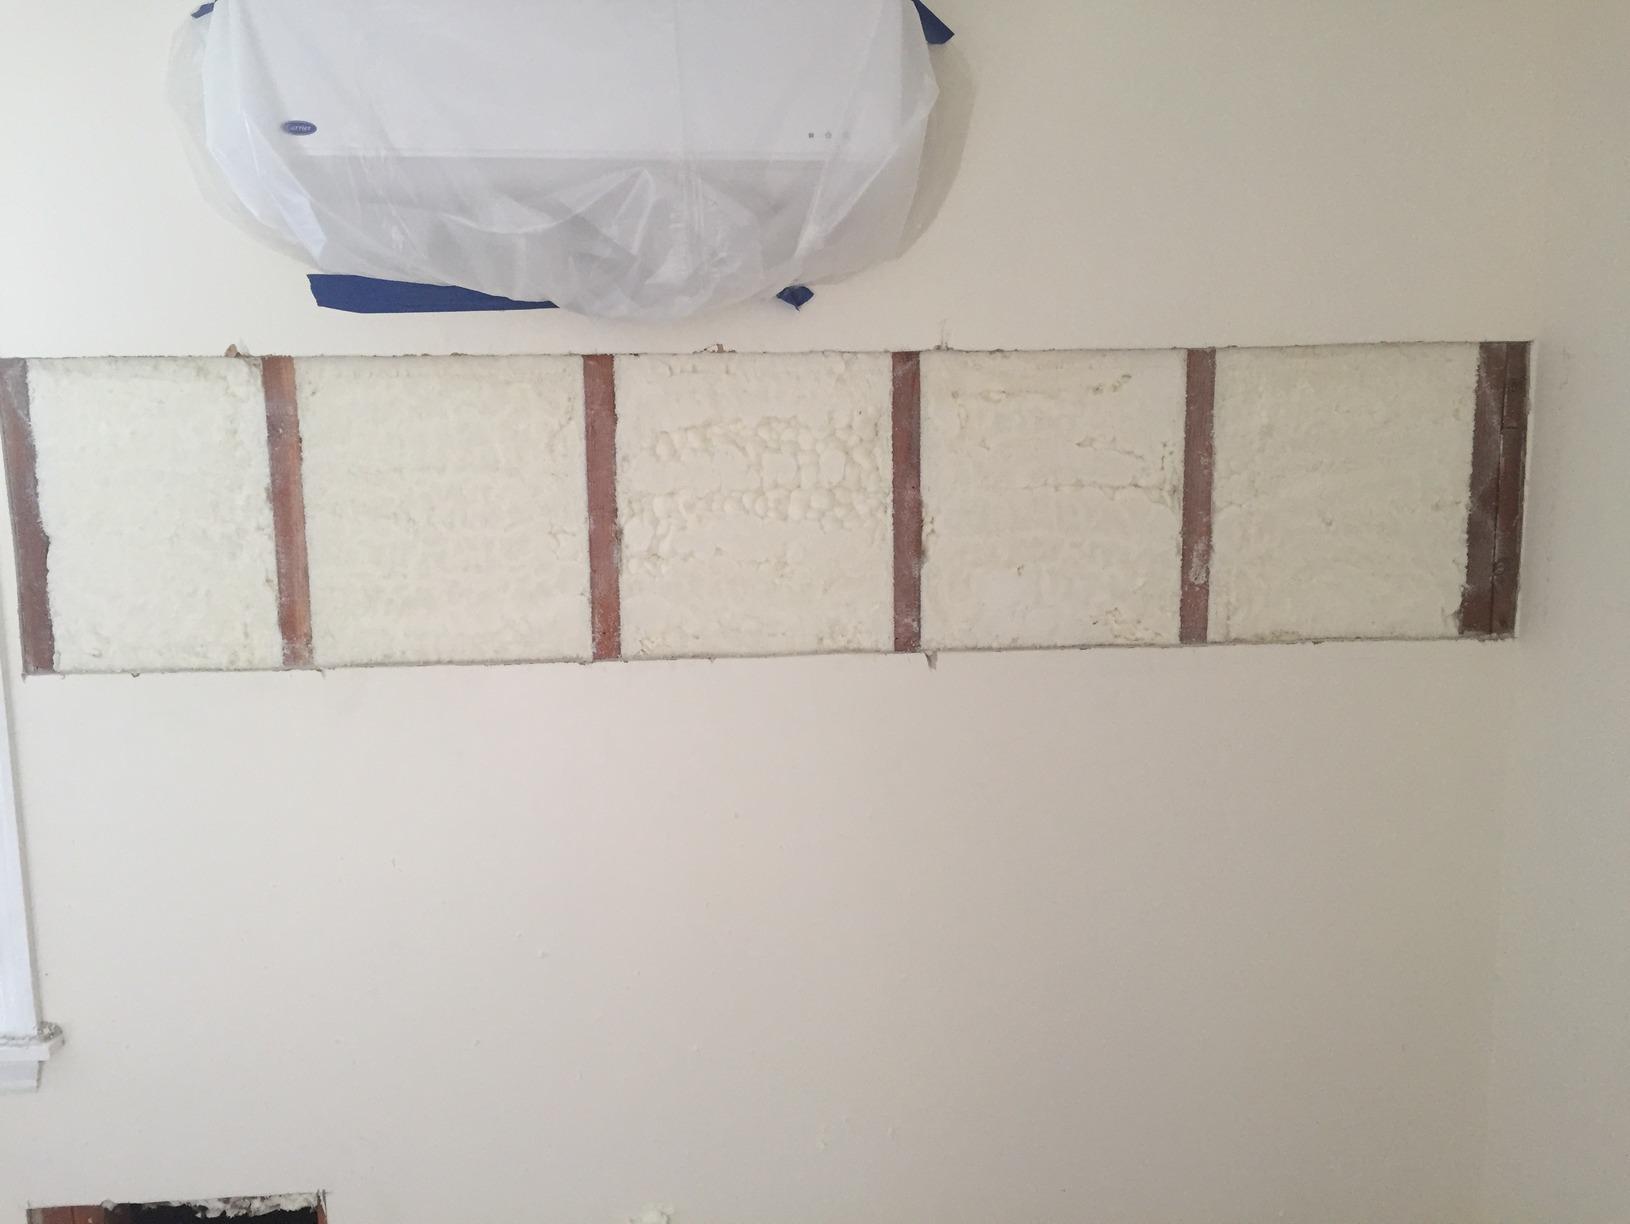 Removing Fiber Glass Insulation & Installing Spray Foam Insulation To Regain Comfort - Sloatsburg, NY - After Photo